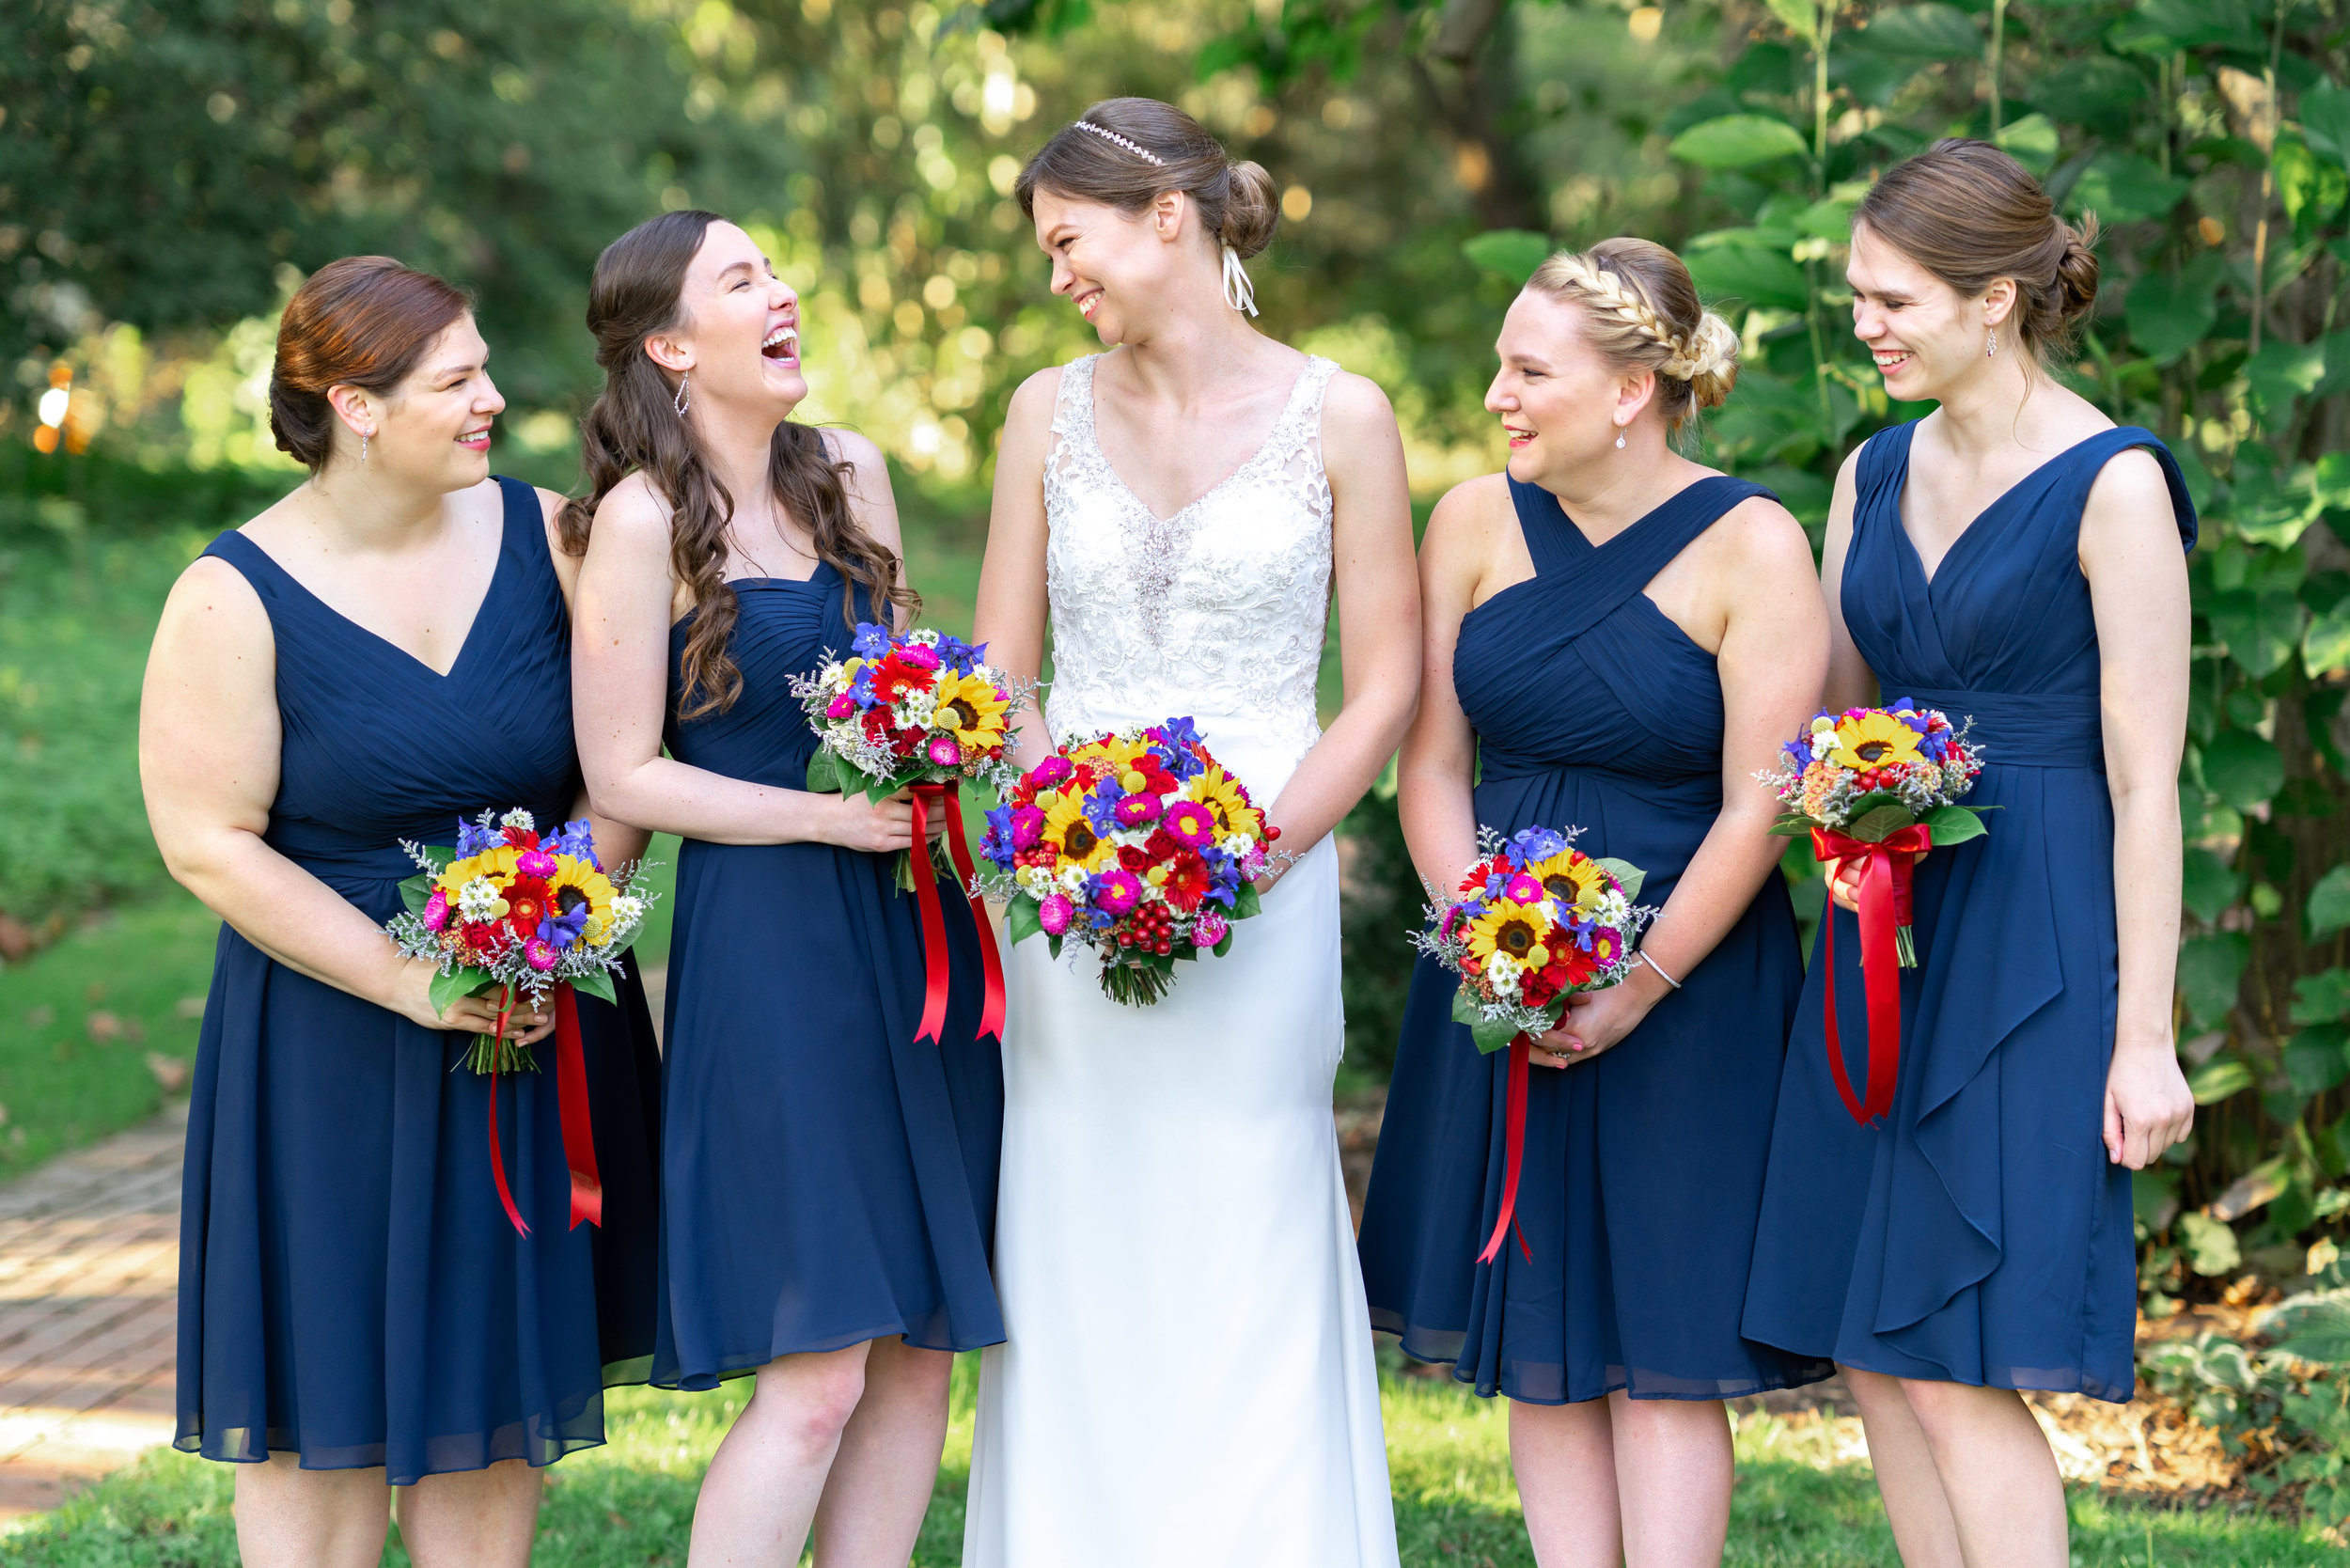 Bride in Morilee Myka and bridesmaids in navy Azazie at Elkridge Furnace Inn